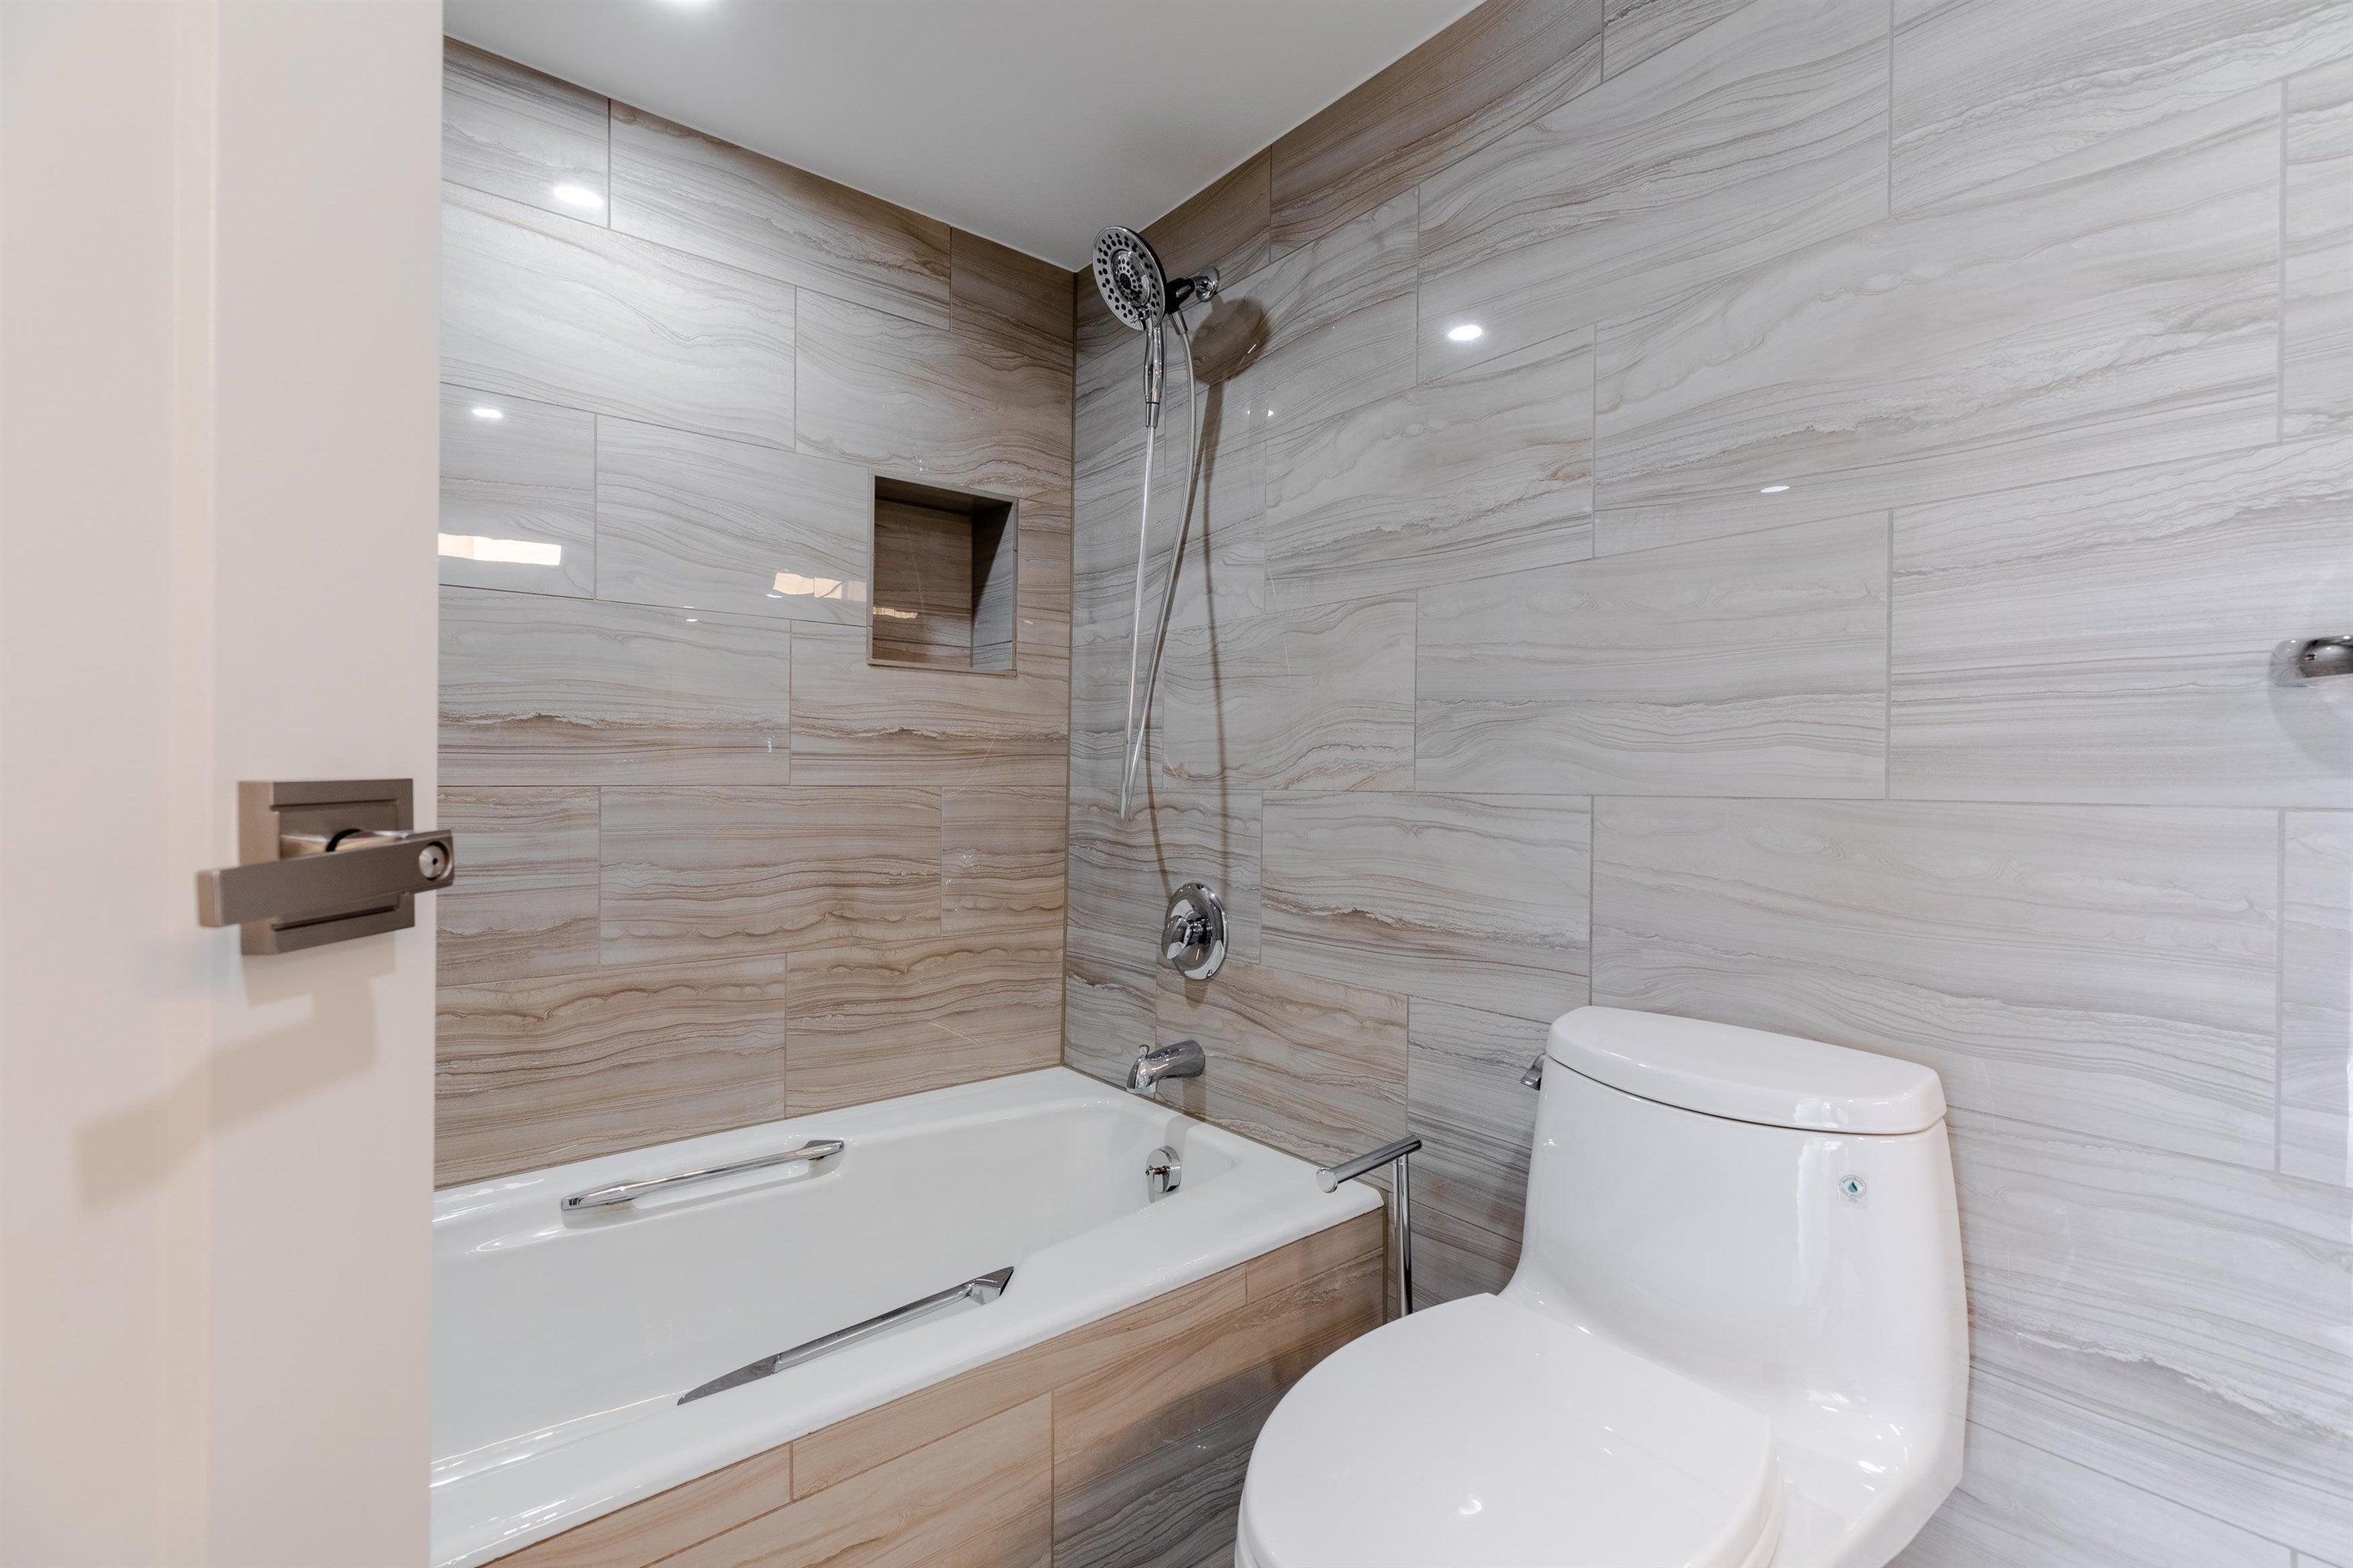 406 1450 PENNYFARTHING DRIVE - False Creek Apartment/Condo for sale, 2 Bedrooms (R2617259) - #27